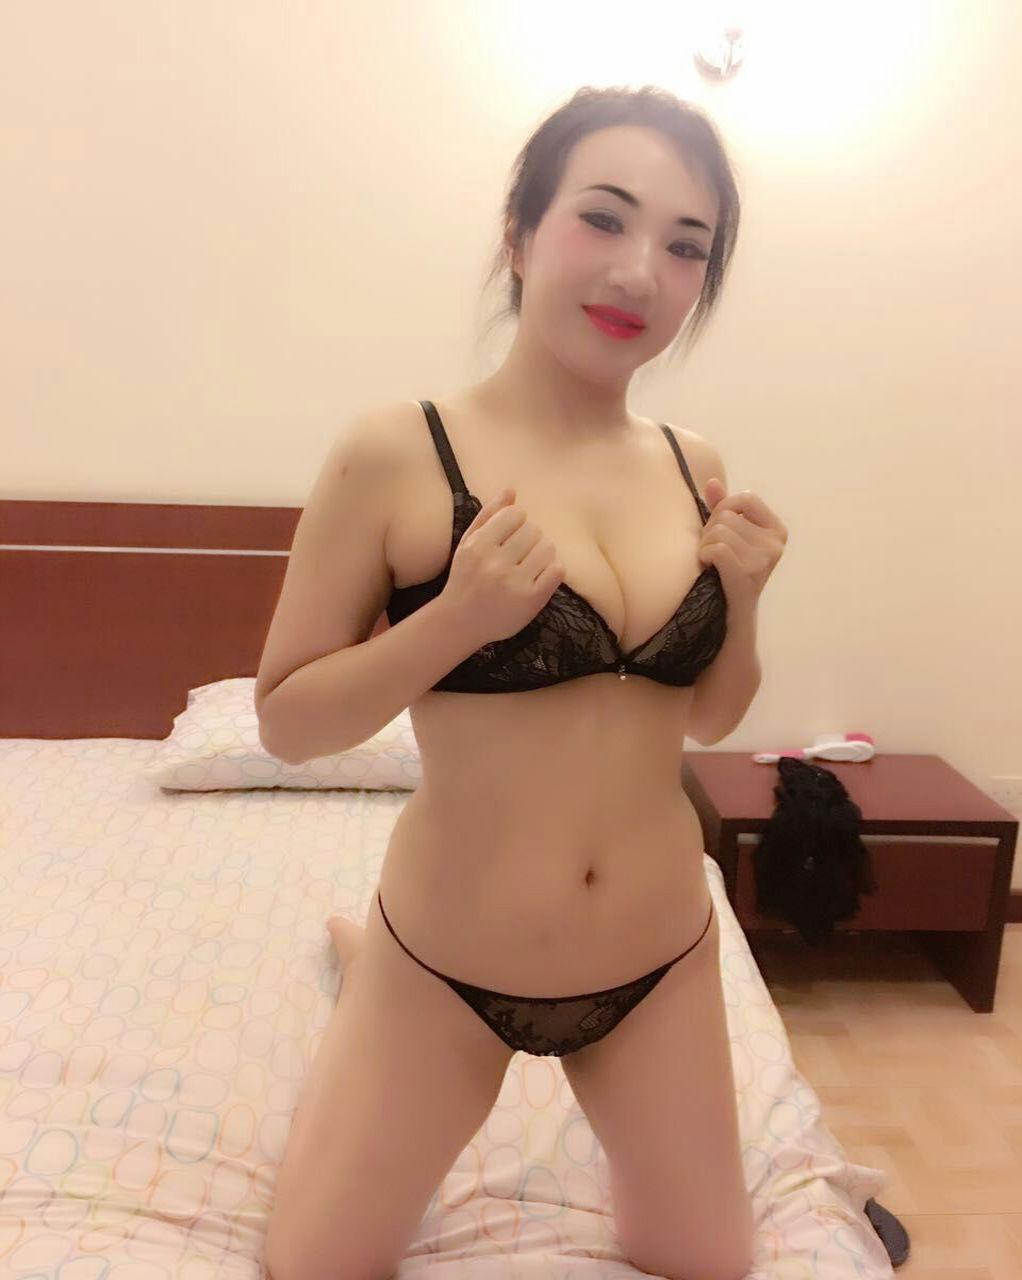 fucking her erect nipples